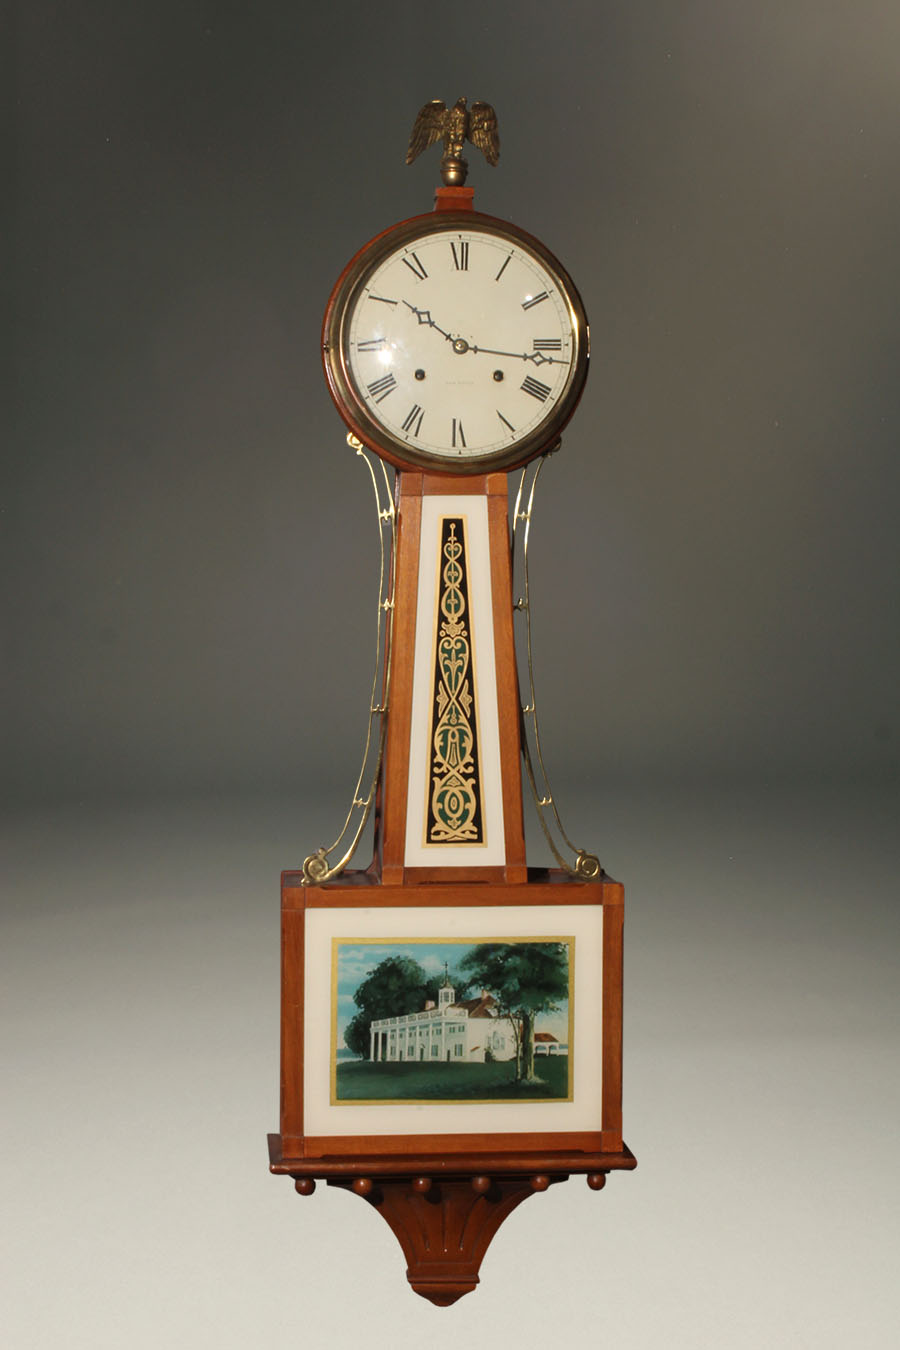 New Haven Clock Co banjo style wall clock